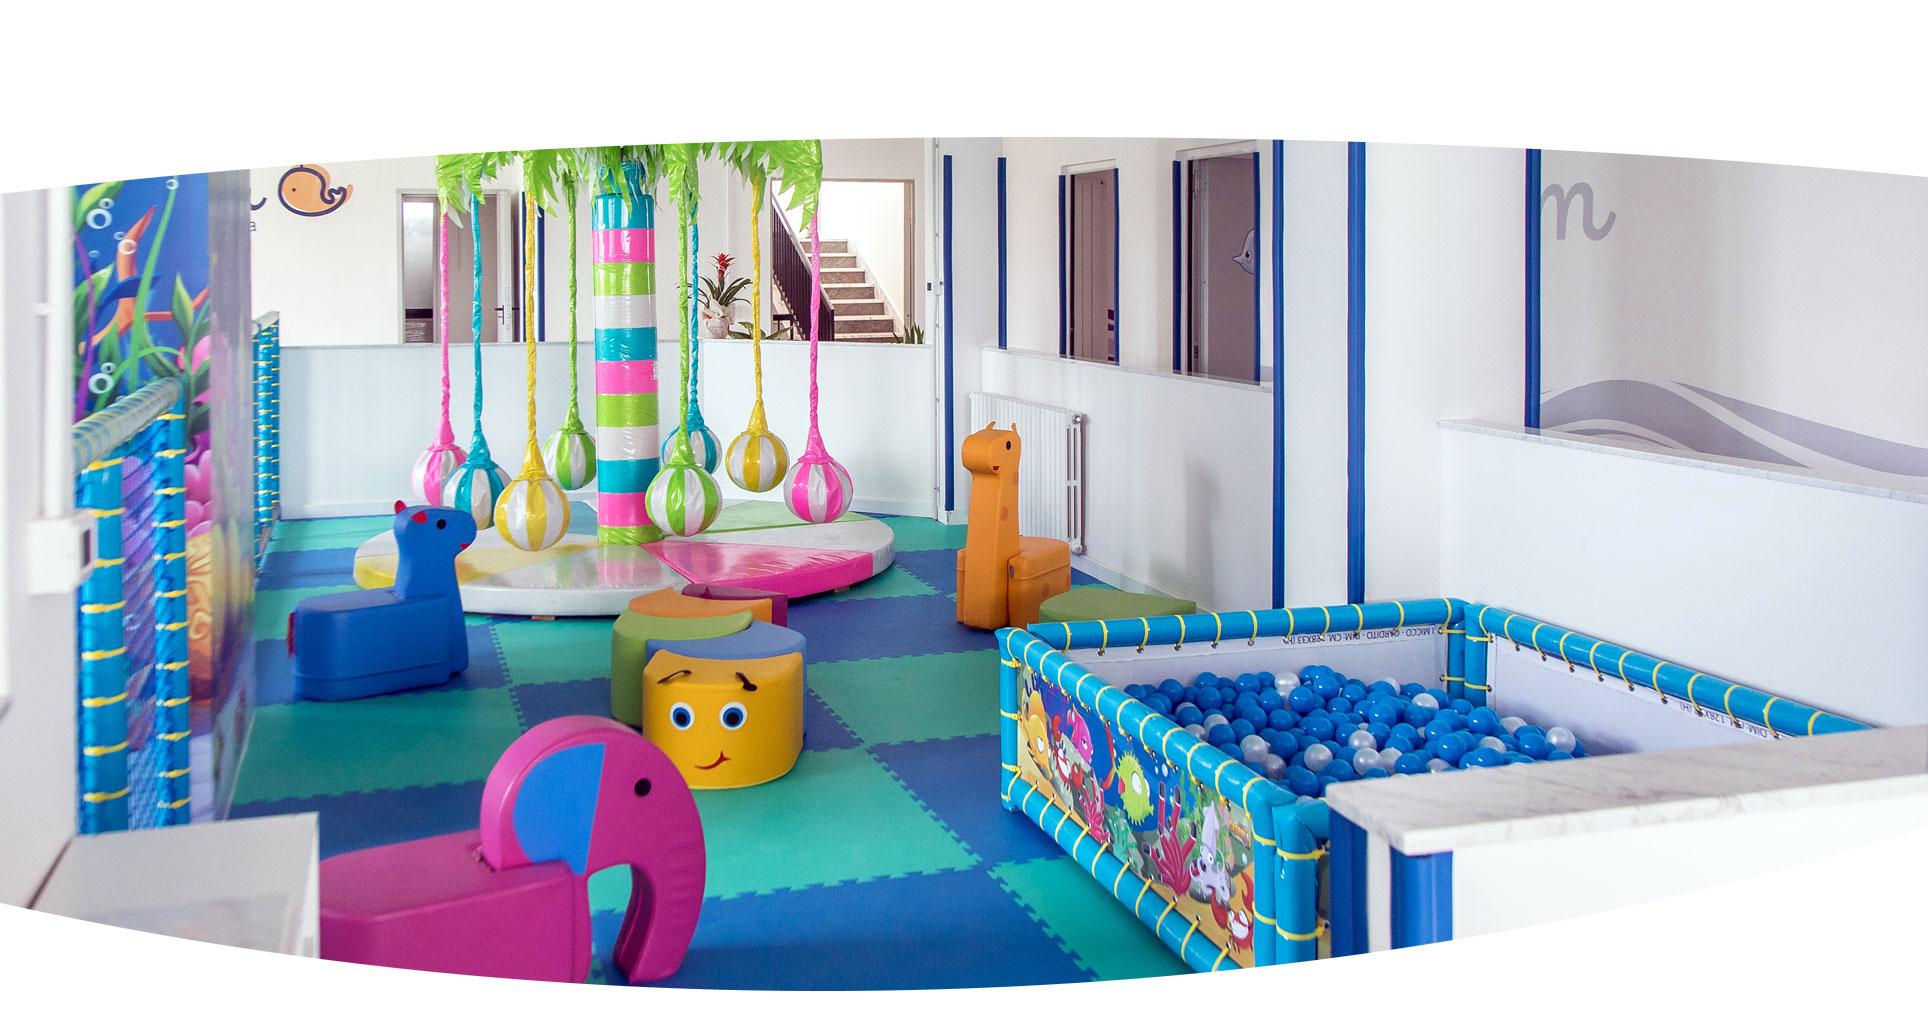 Balum | Scuola d'Infanzia - Ludoteca